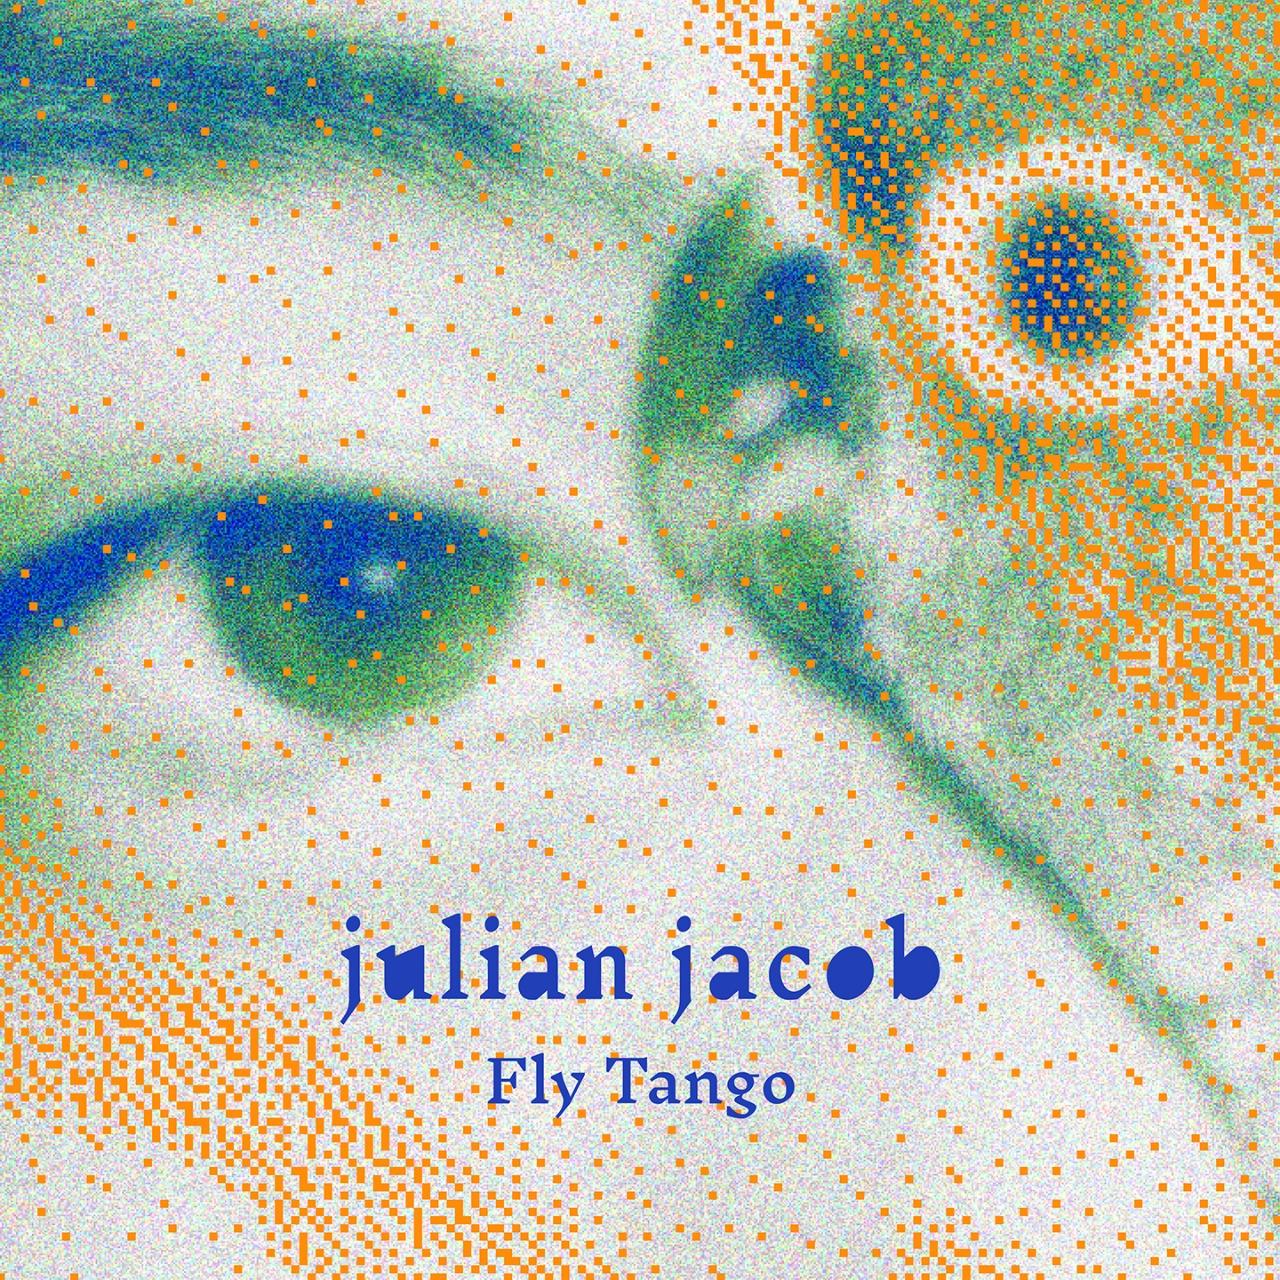 Julian Jacob rilis single terbaru 'Fly Tango'